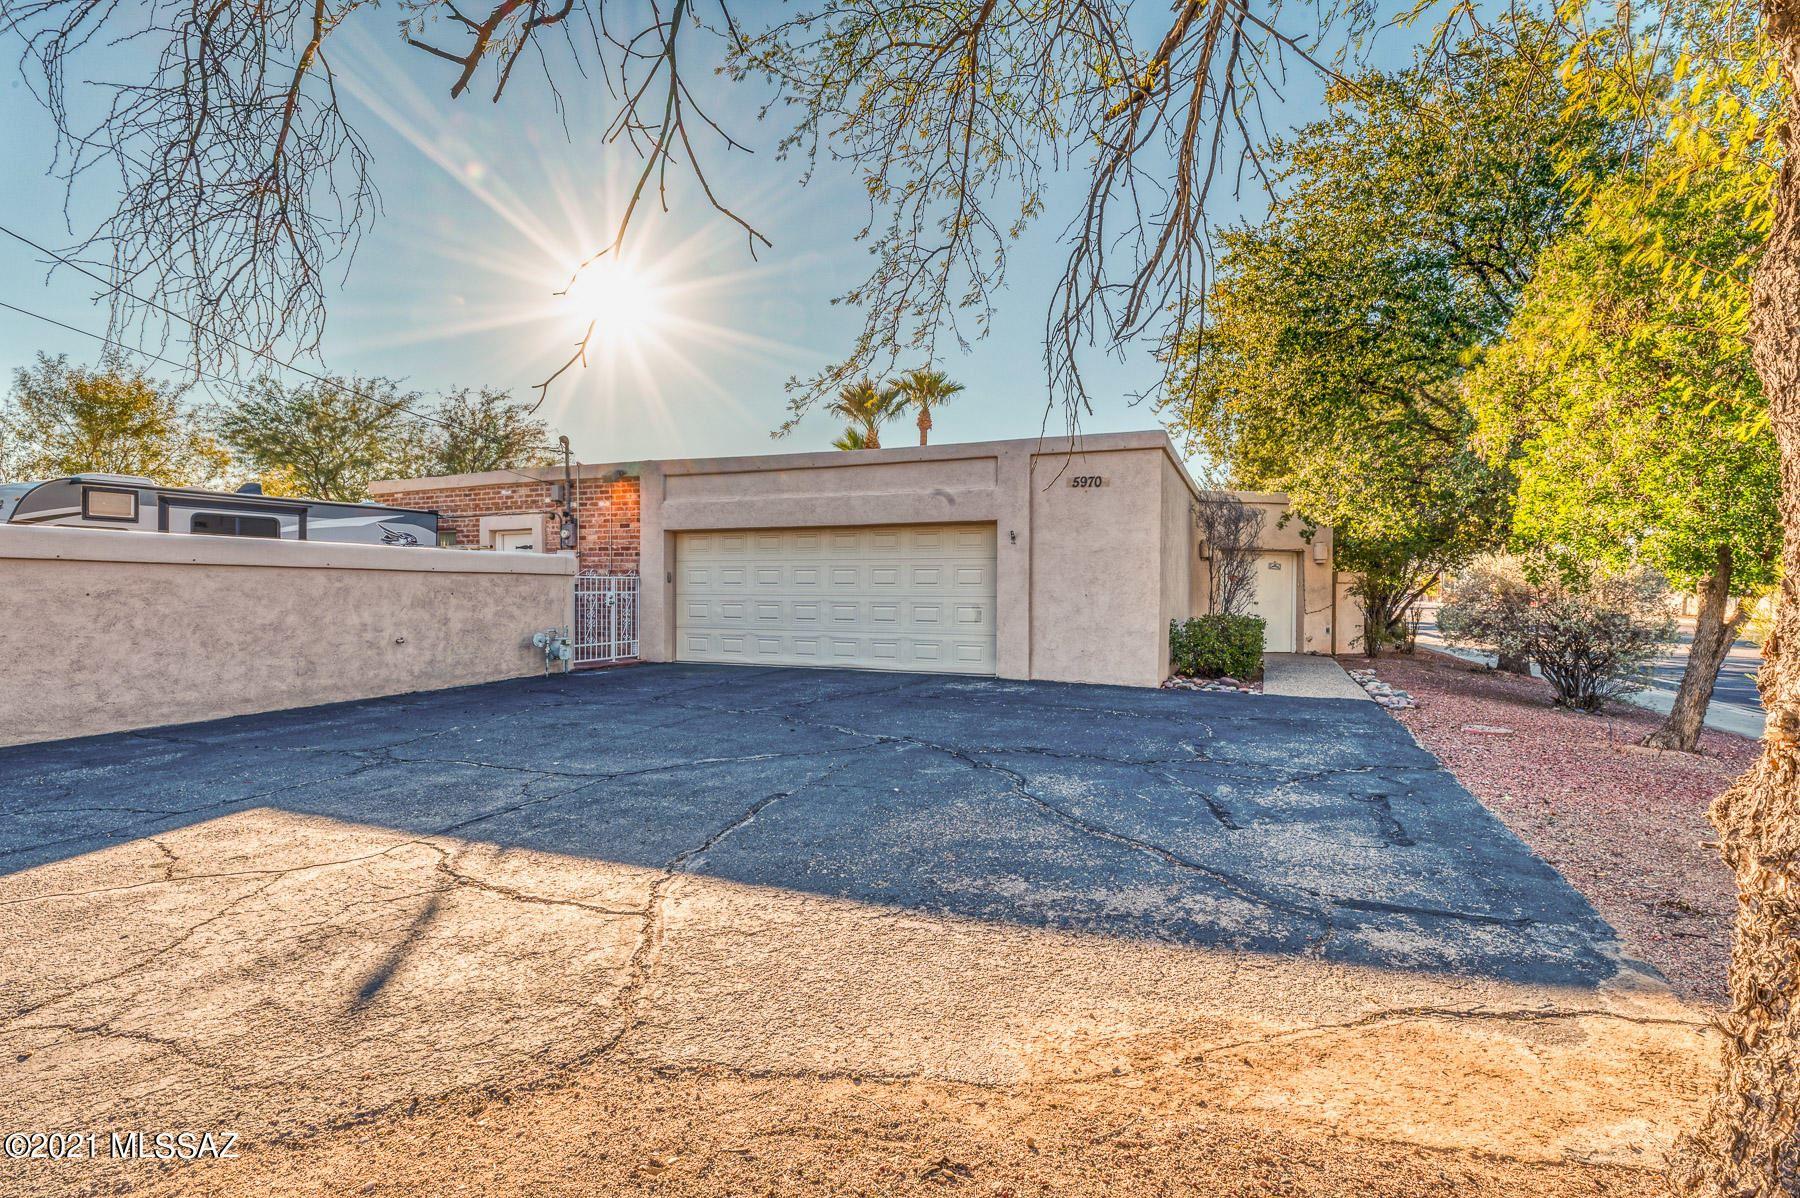 5970 E Pima Street, Tucson, AZ 85712 - MLS#: 22101048